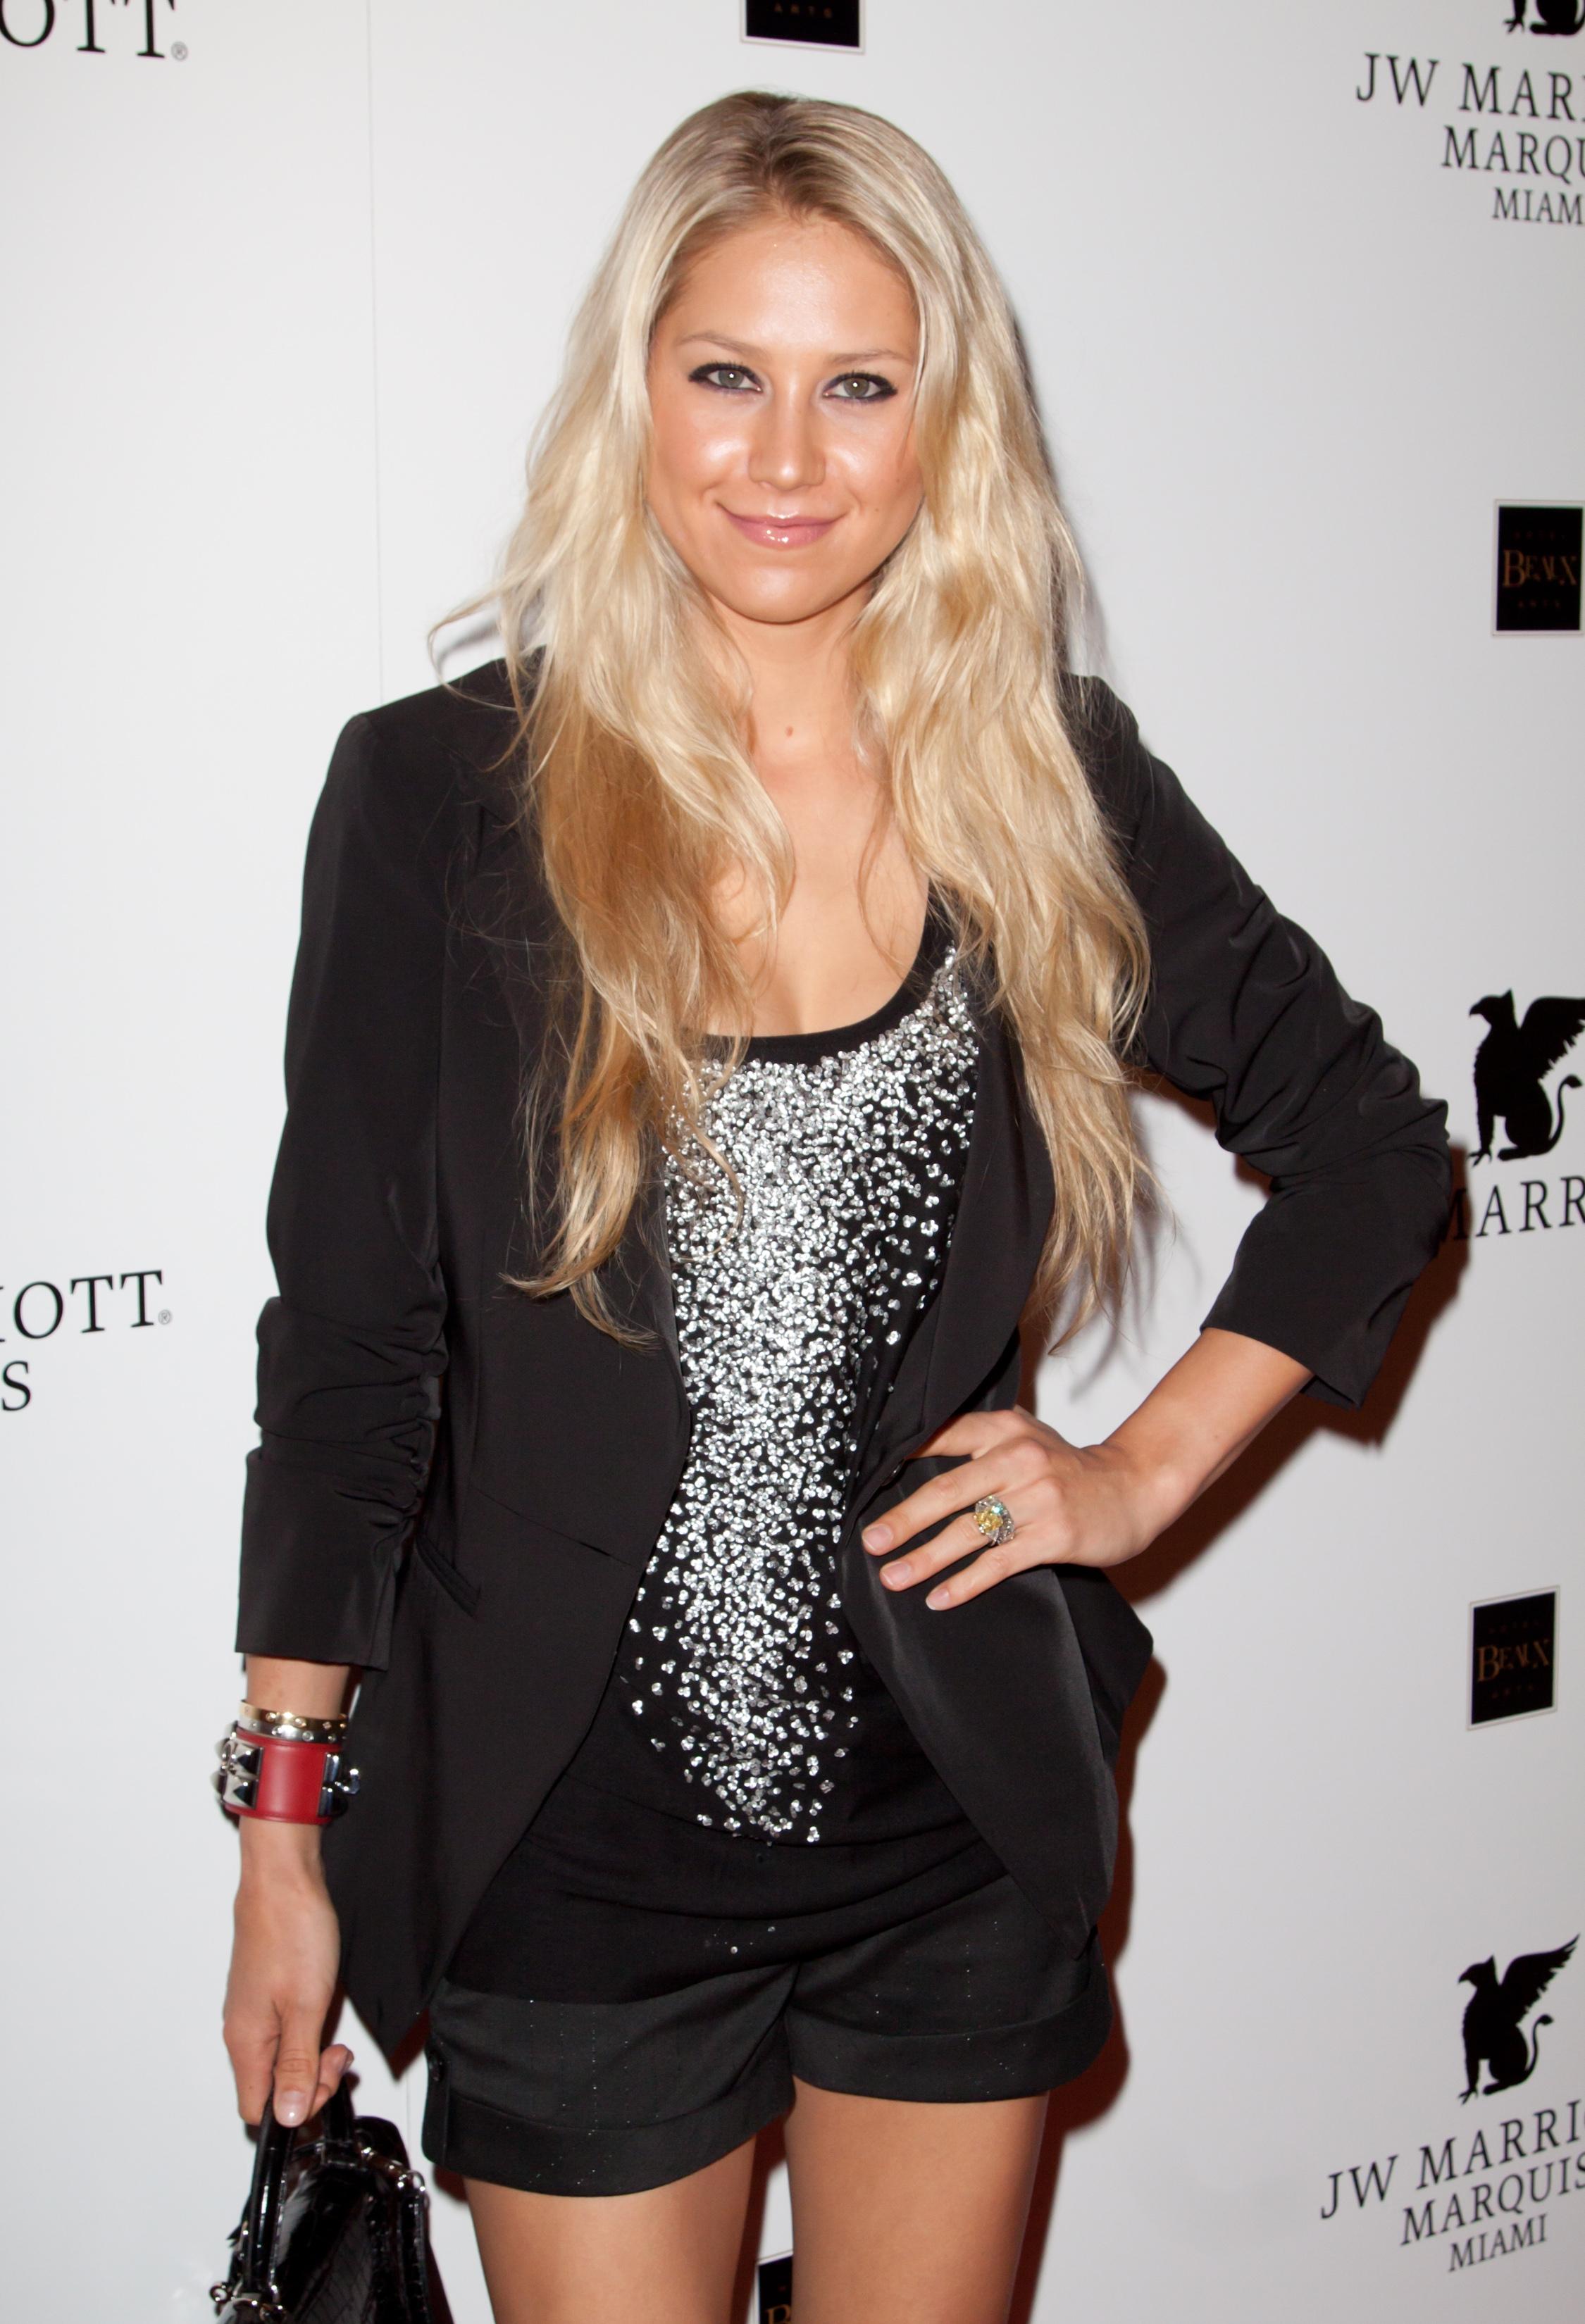 c1ffcf3dba9e Confirmed: Tennis Star Anna Kournikova Joining 'The Biggest Loser ...